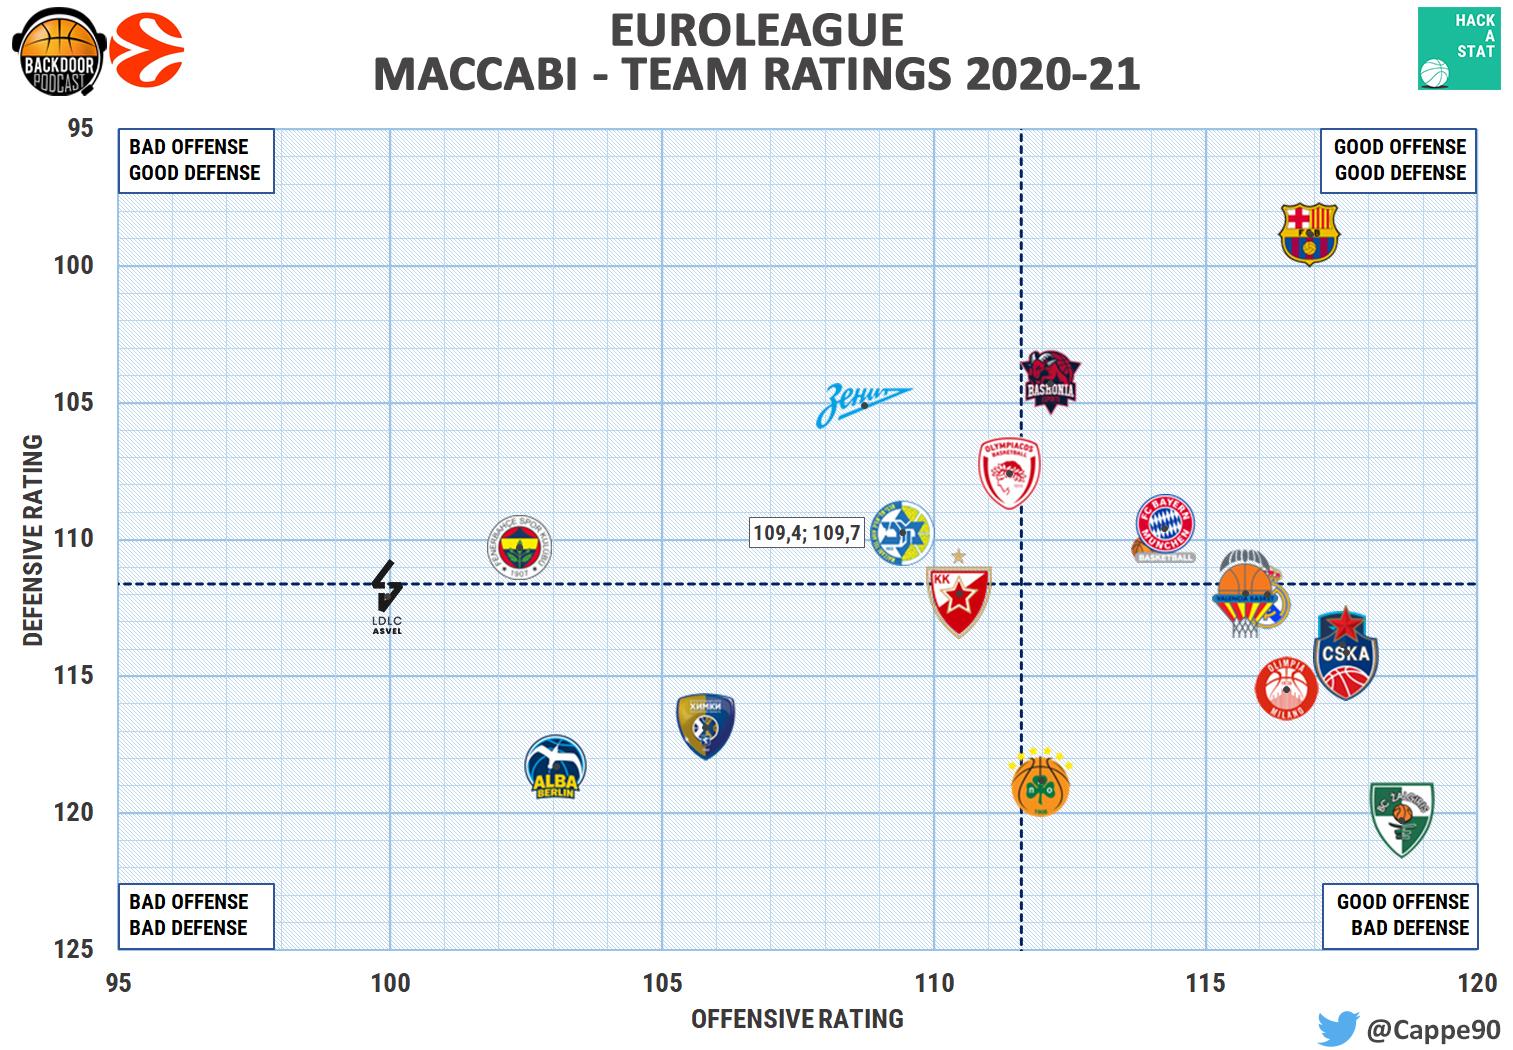 maccabi's defense rating chart